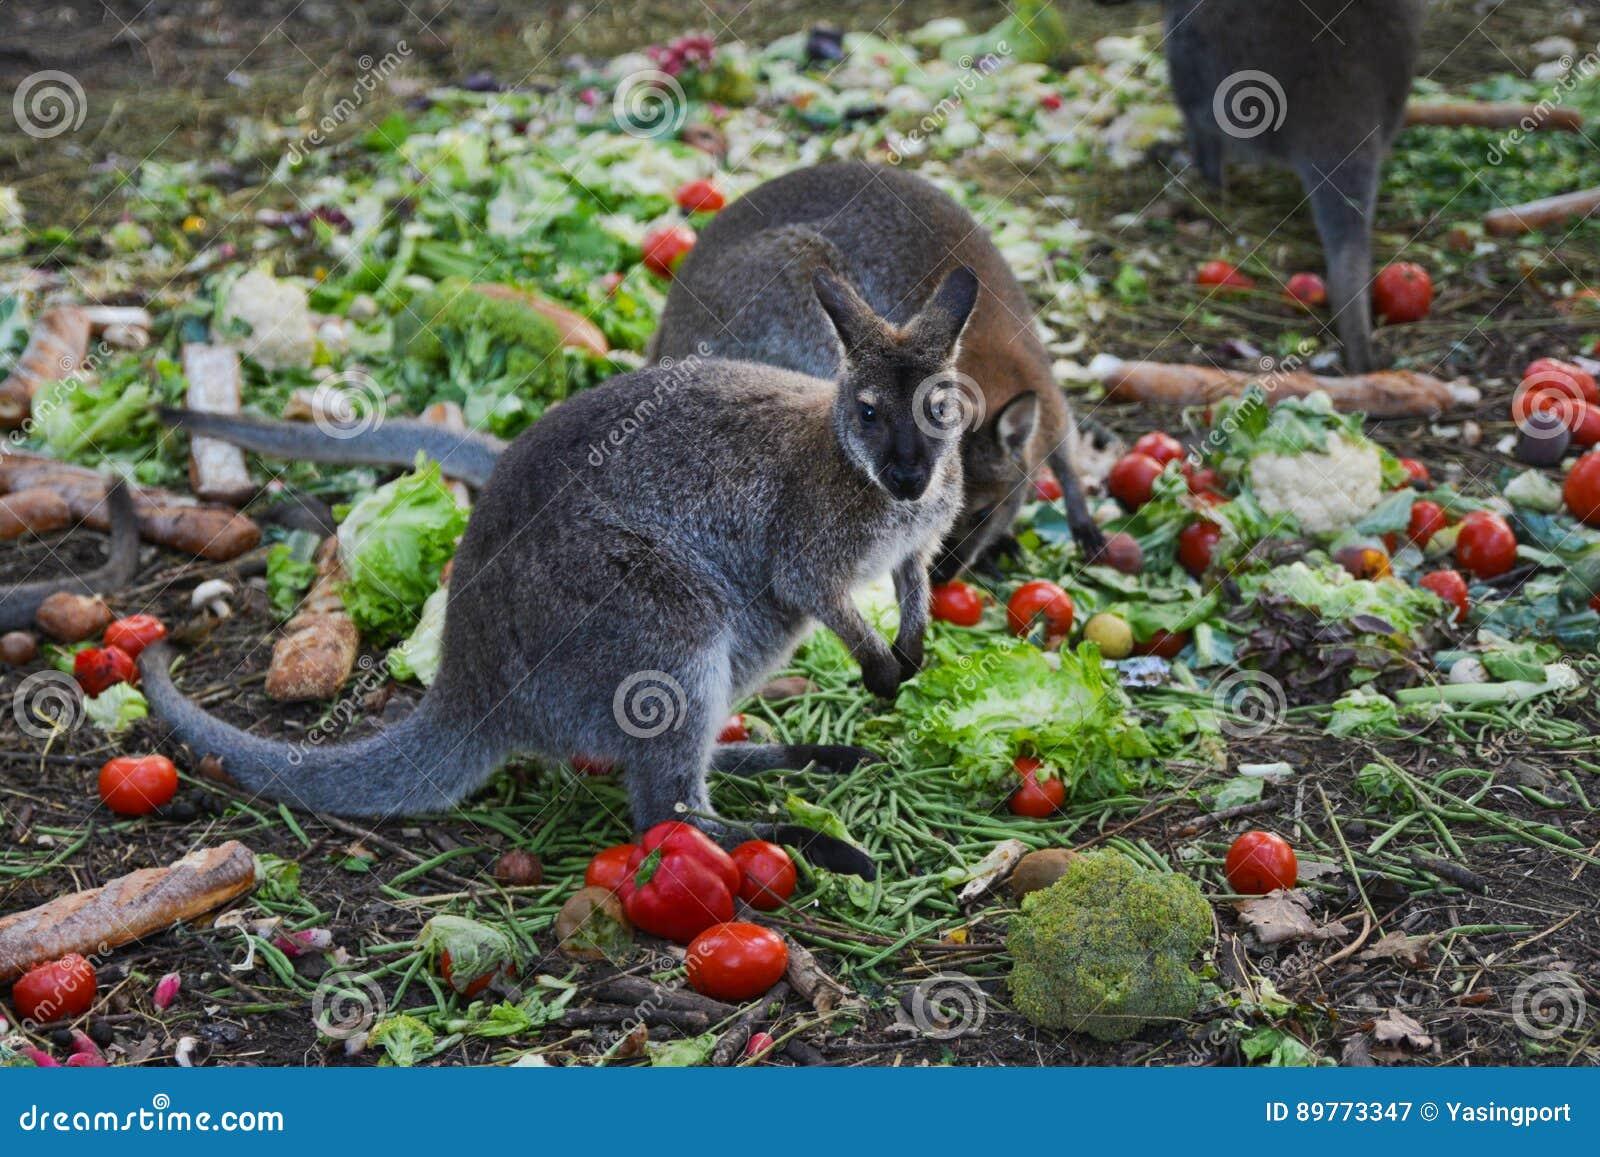 Kangourou mangeant des légumes